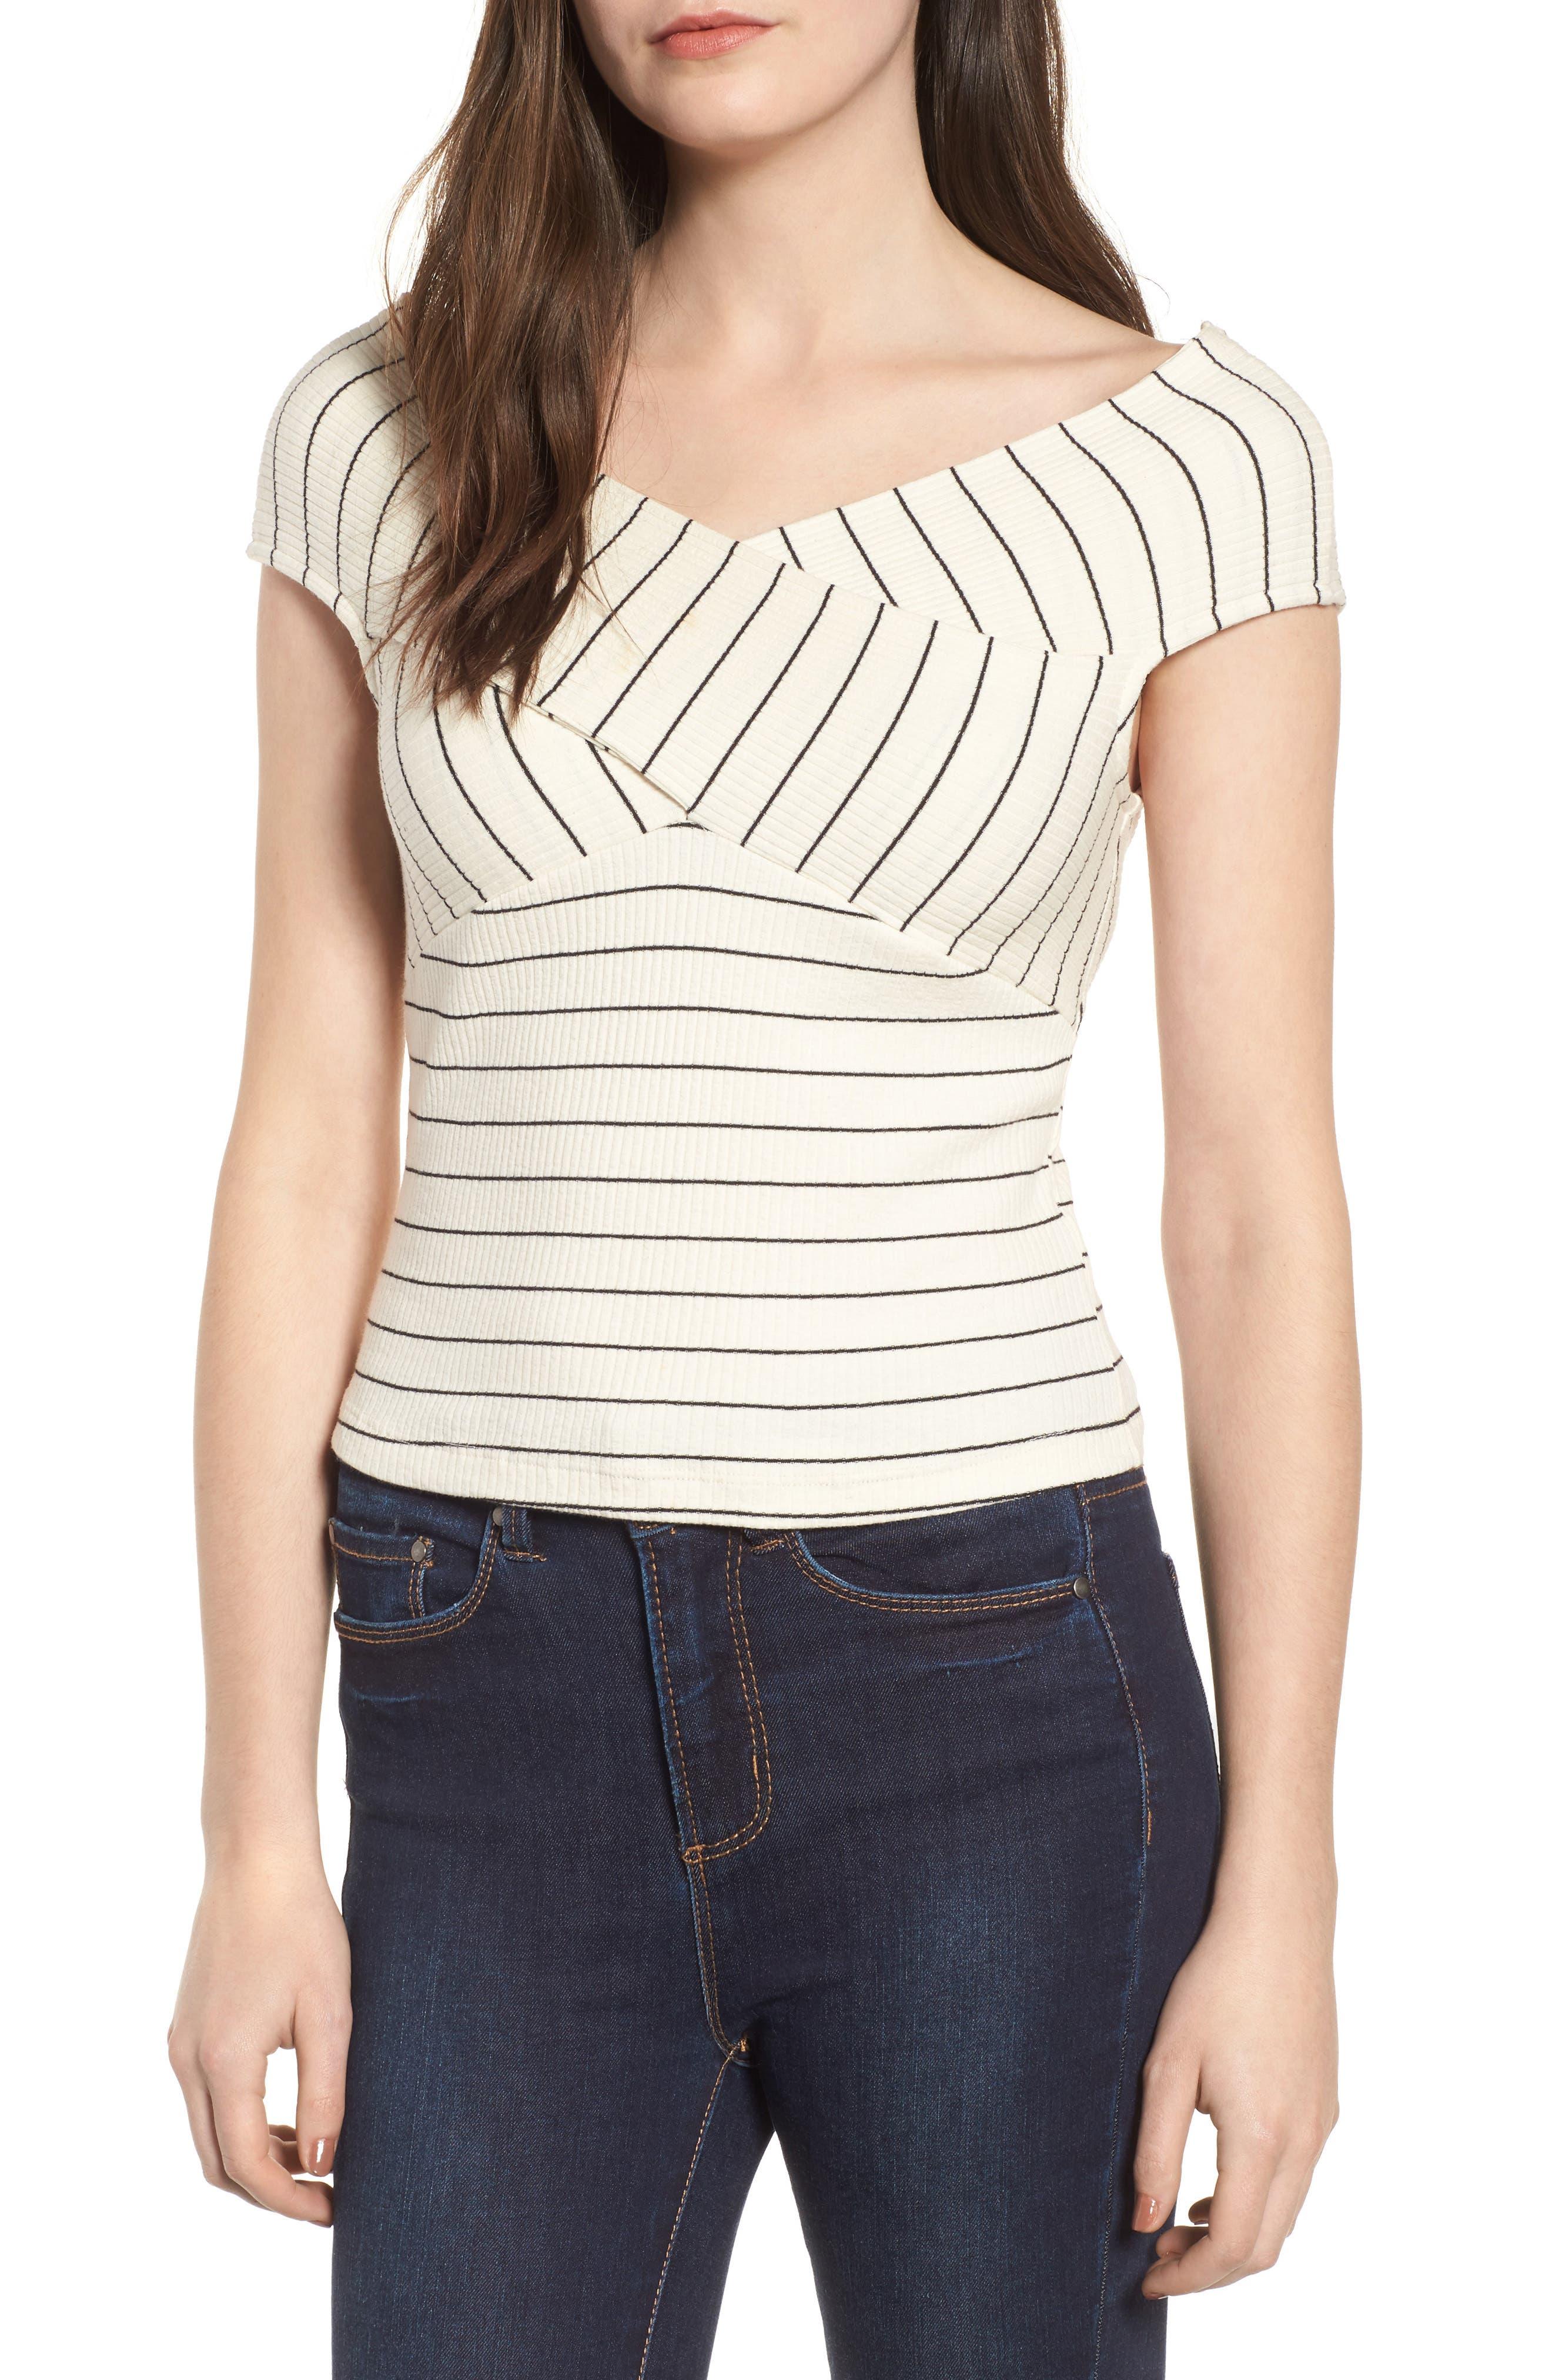 Crisscross Off the Shoulder Top,                         Main,                         color, Ivory/ Black